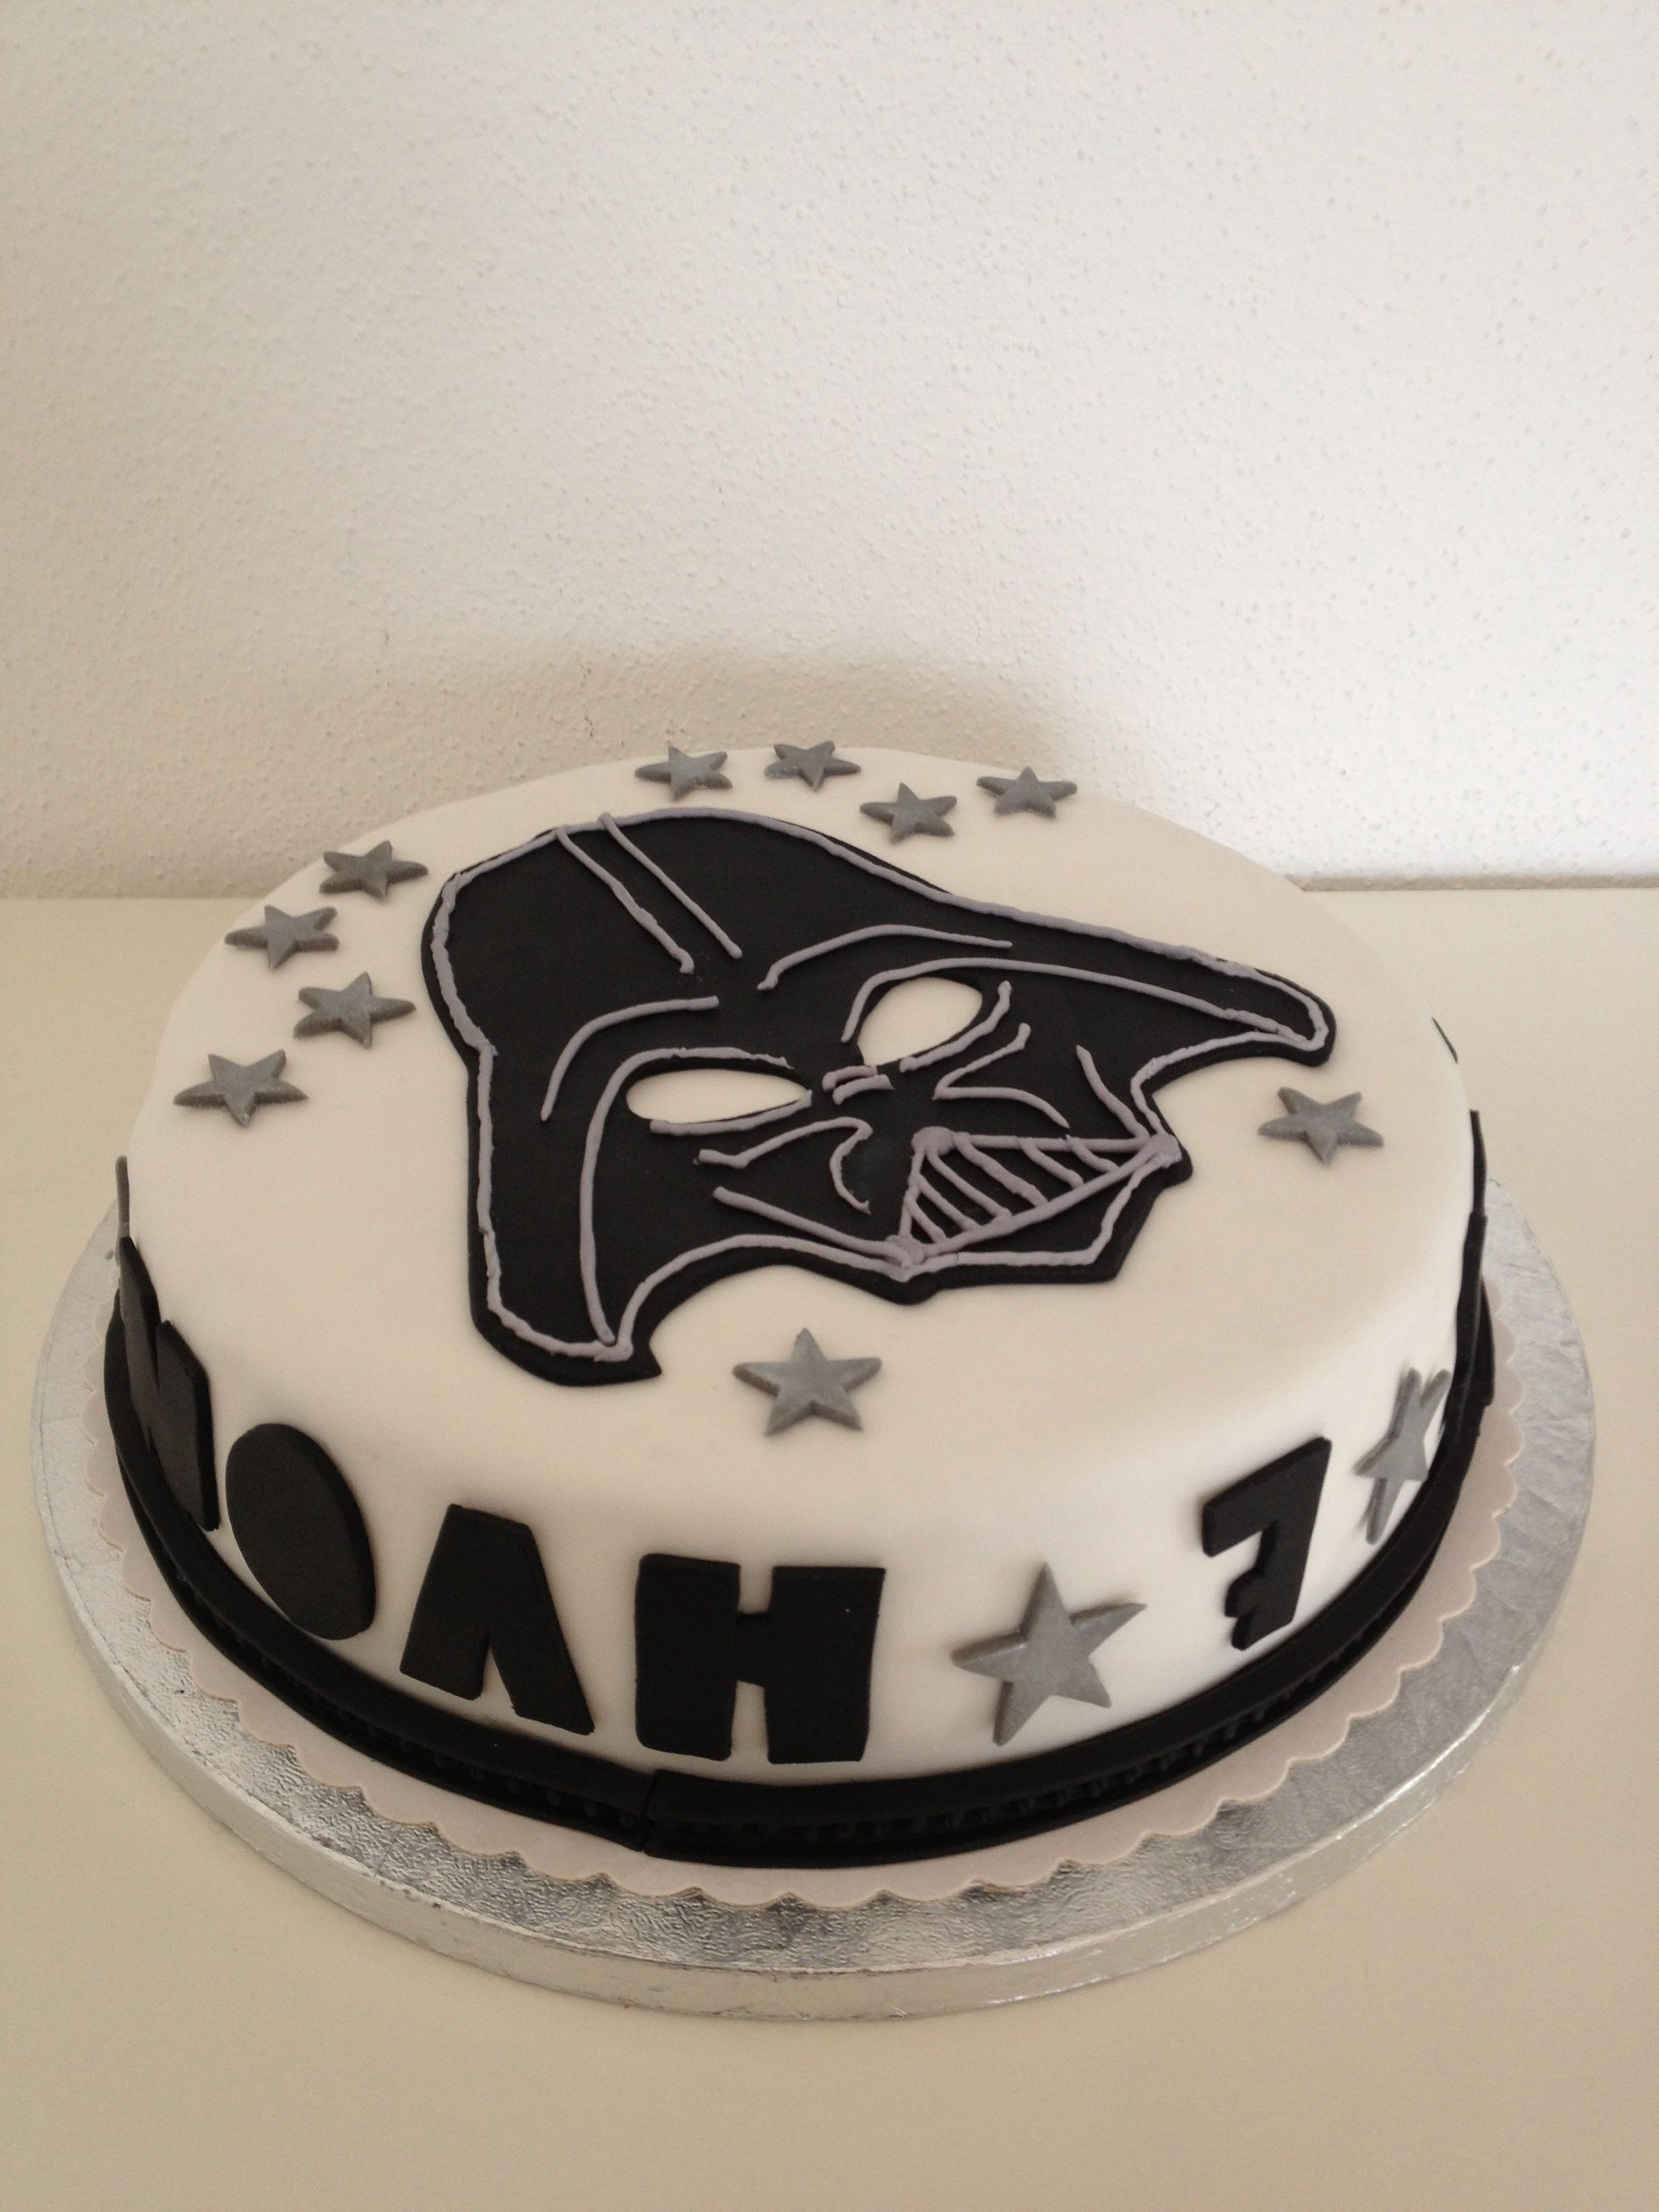 star wars taart Star Wars taart   torty   Pinterest   Star, Star wars cake and Cake star wars taart